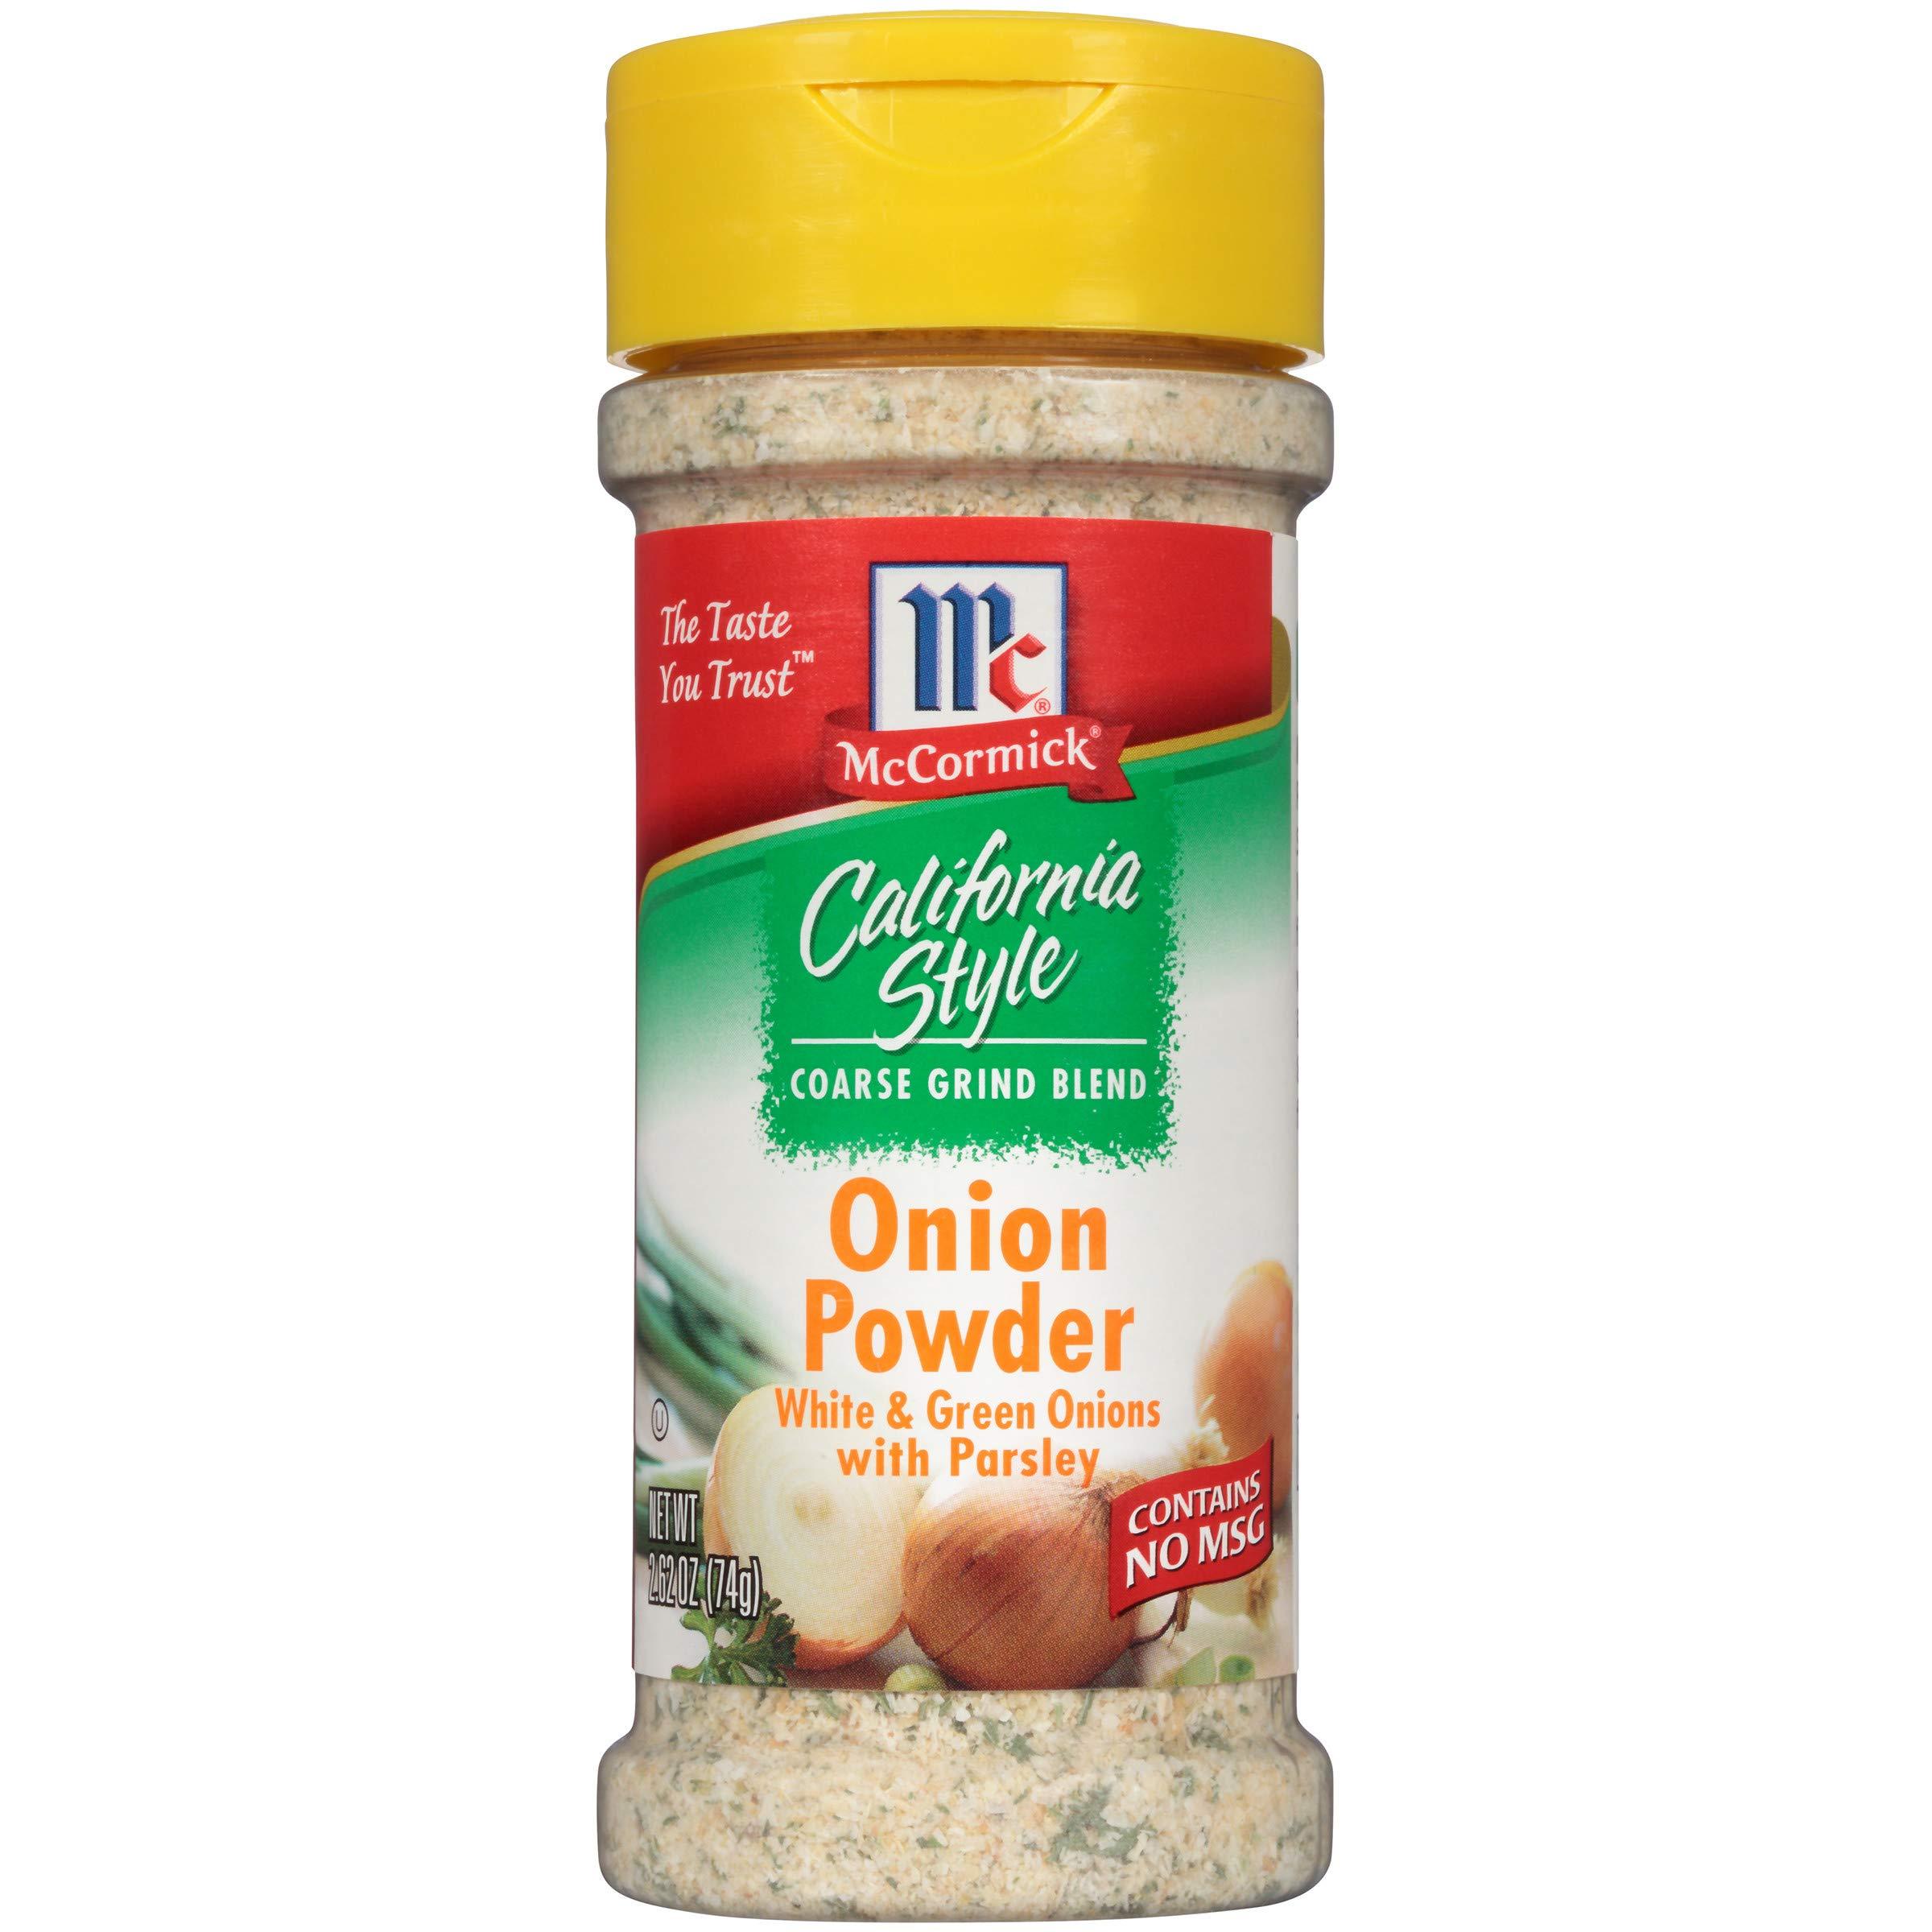 McCormick California Style Onion Powder, 2.62 oz